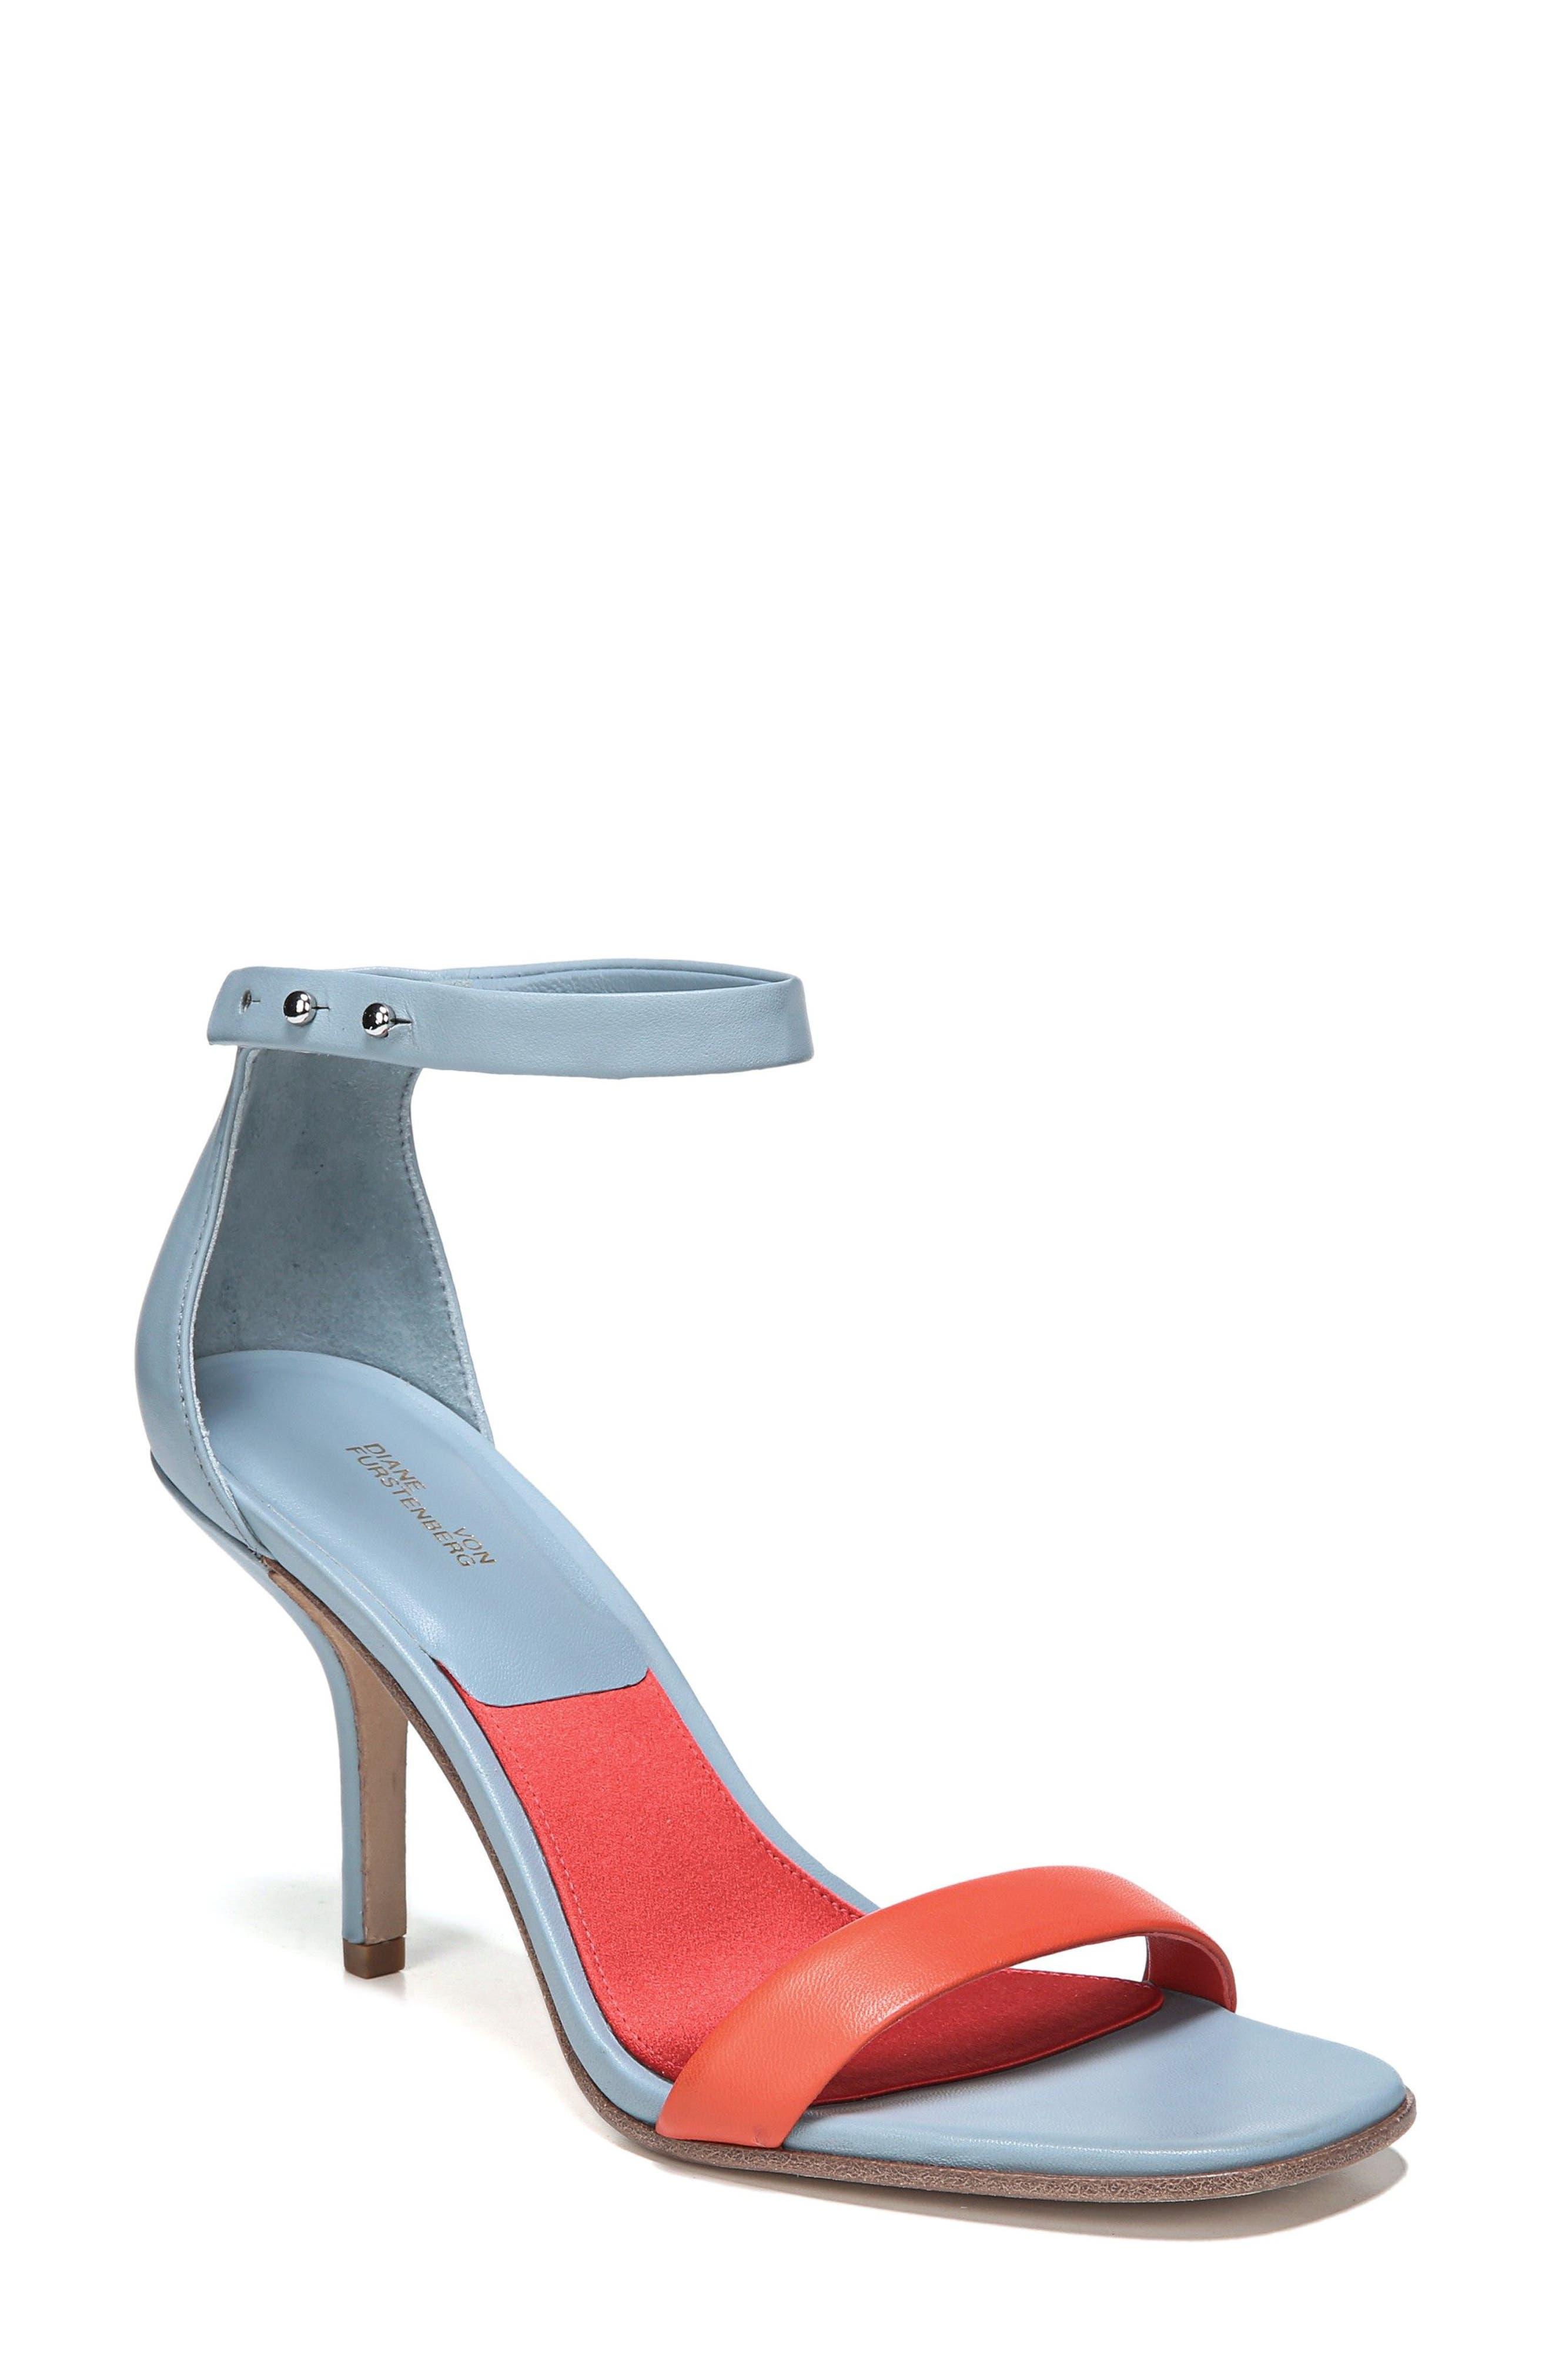 Alternate Image 1 Selected - Diane Von Furstenberg Ferrara Ankle Strap Sandal (Women)